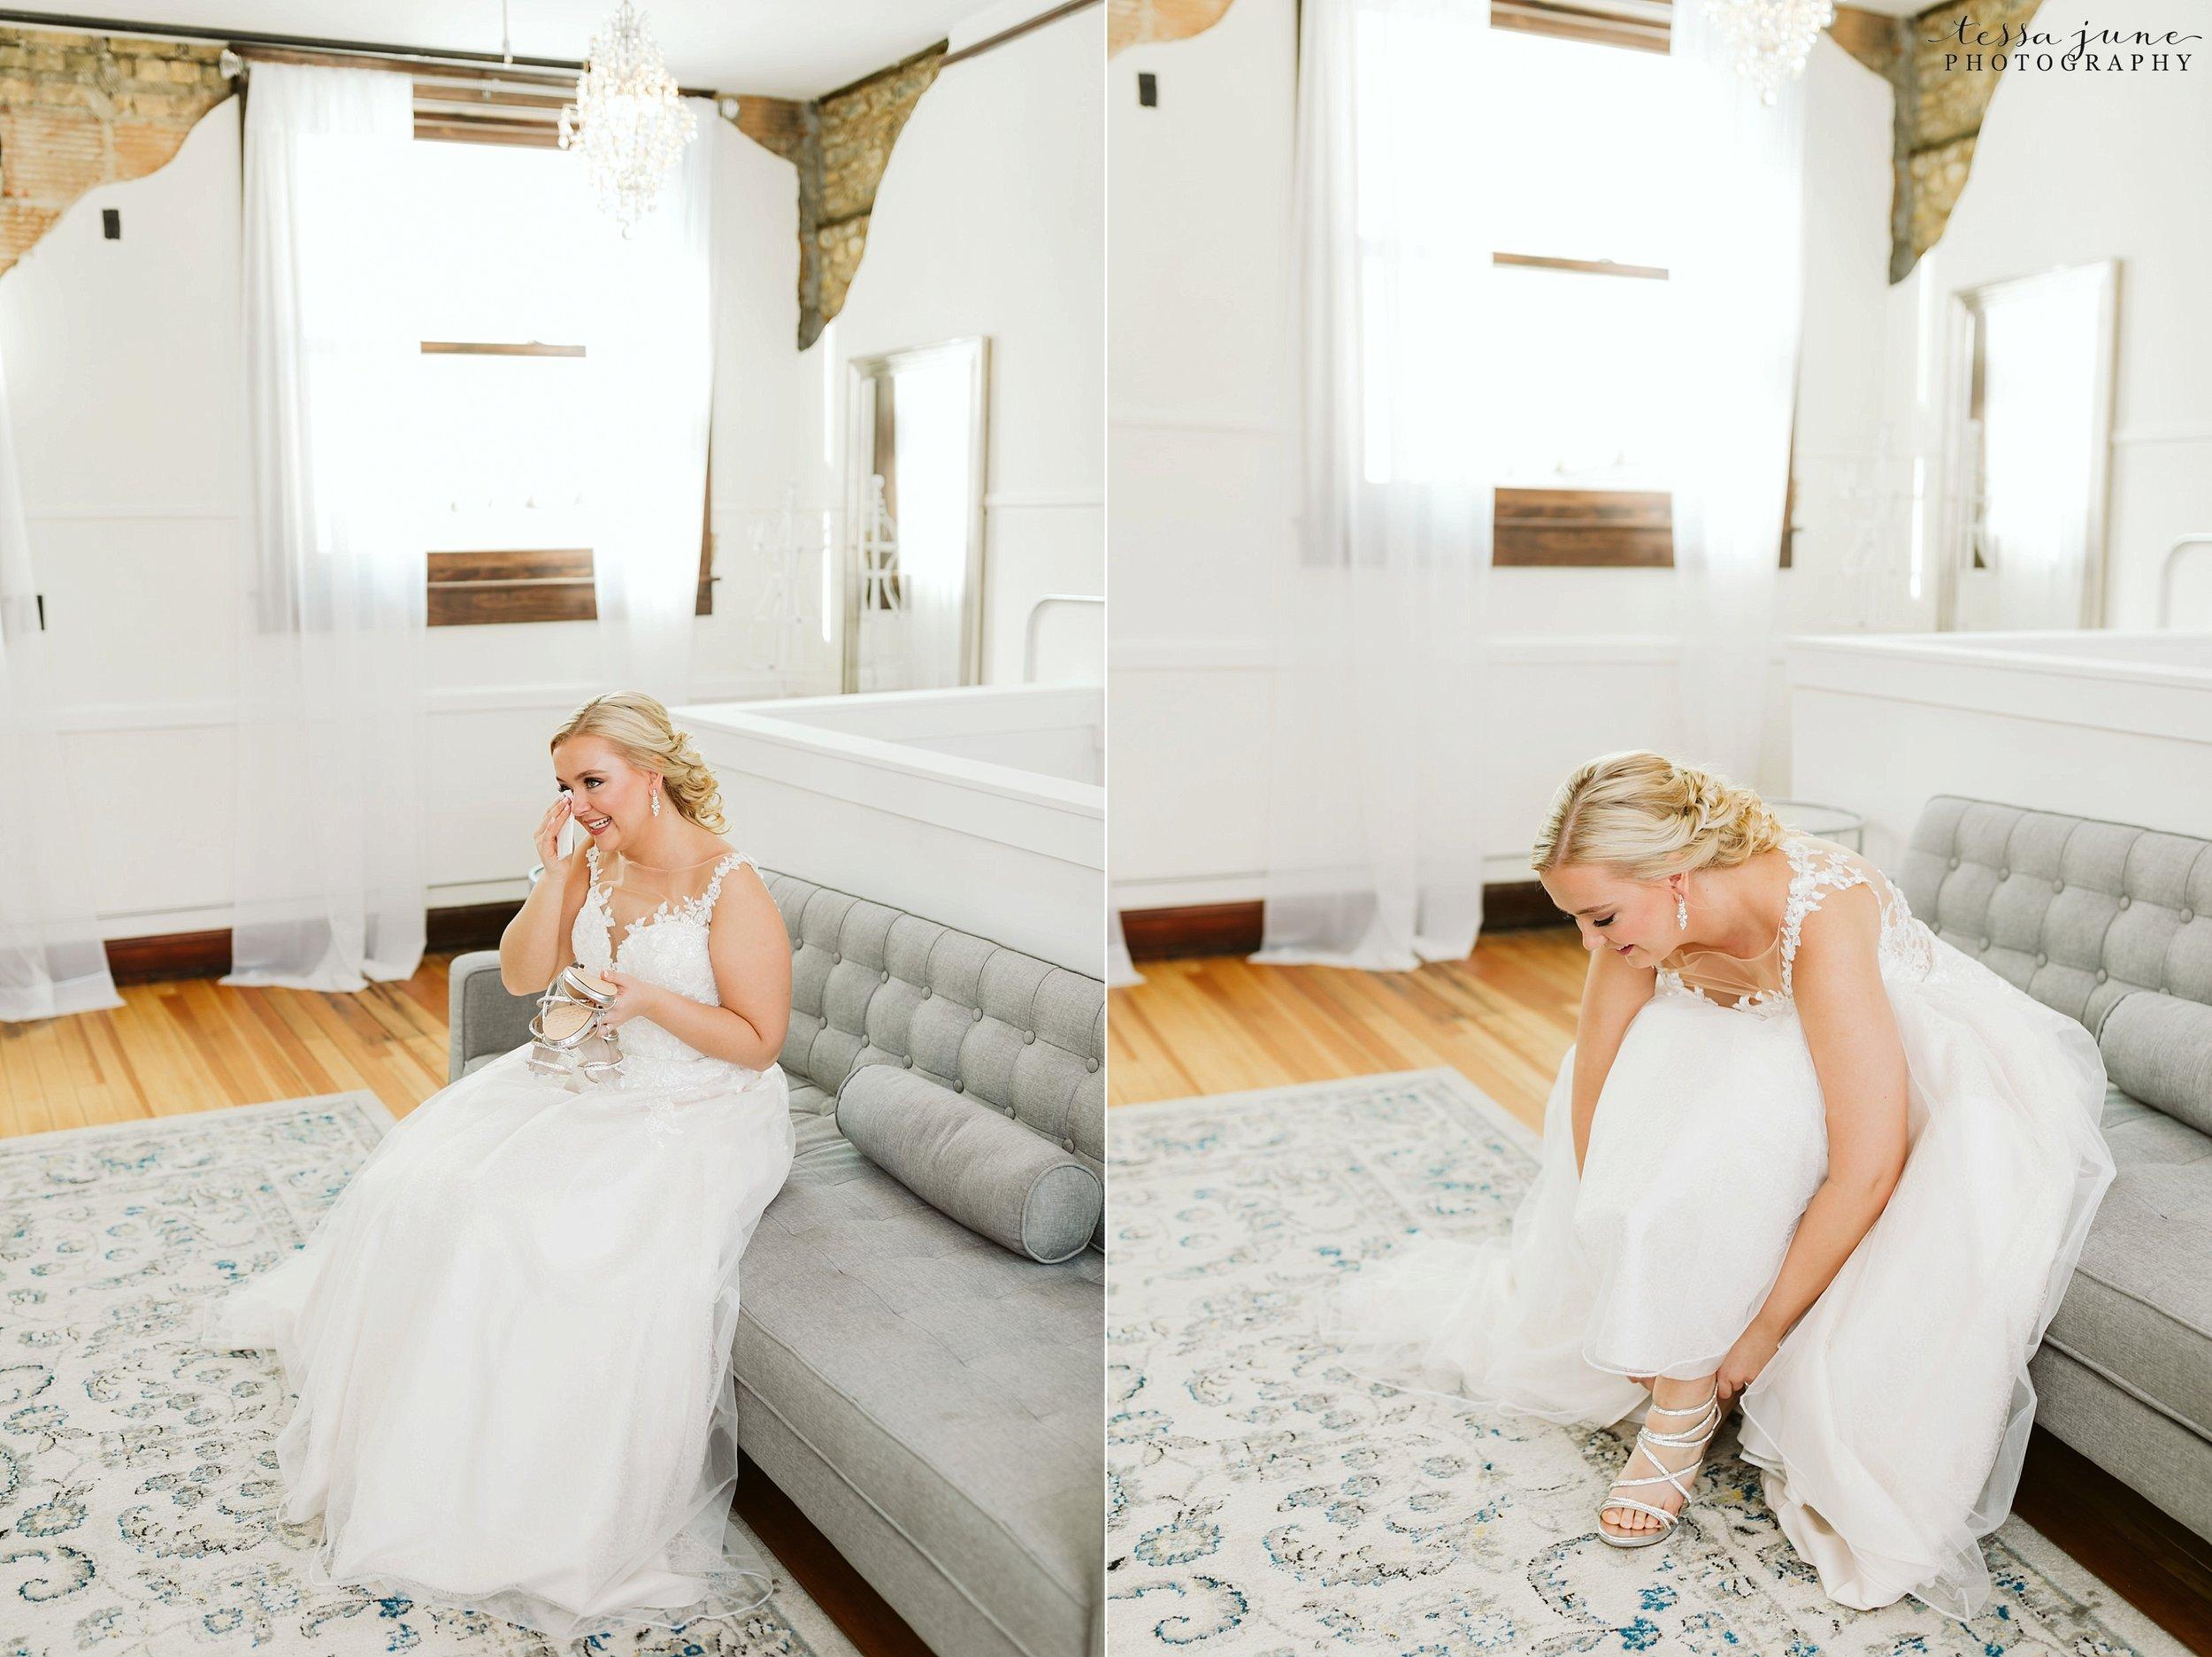 the-3-ten-event-venue-november-elegant-cozy-wedding-faribault-minnesota-28.jpg